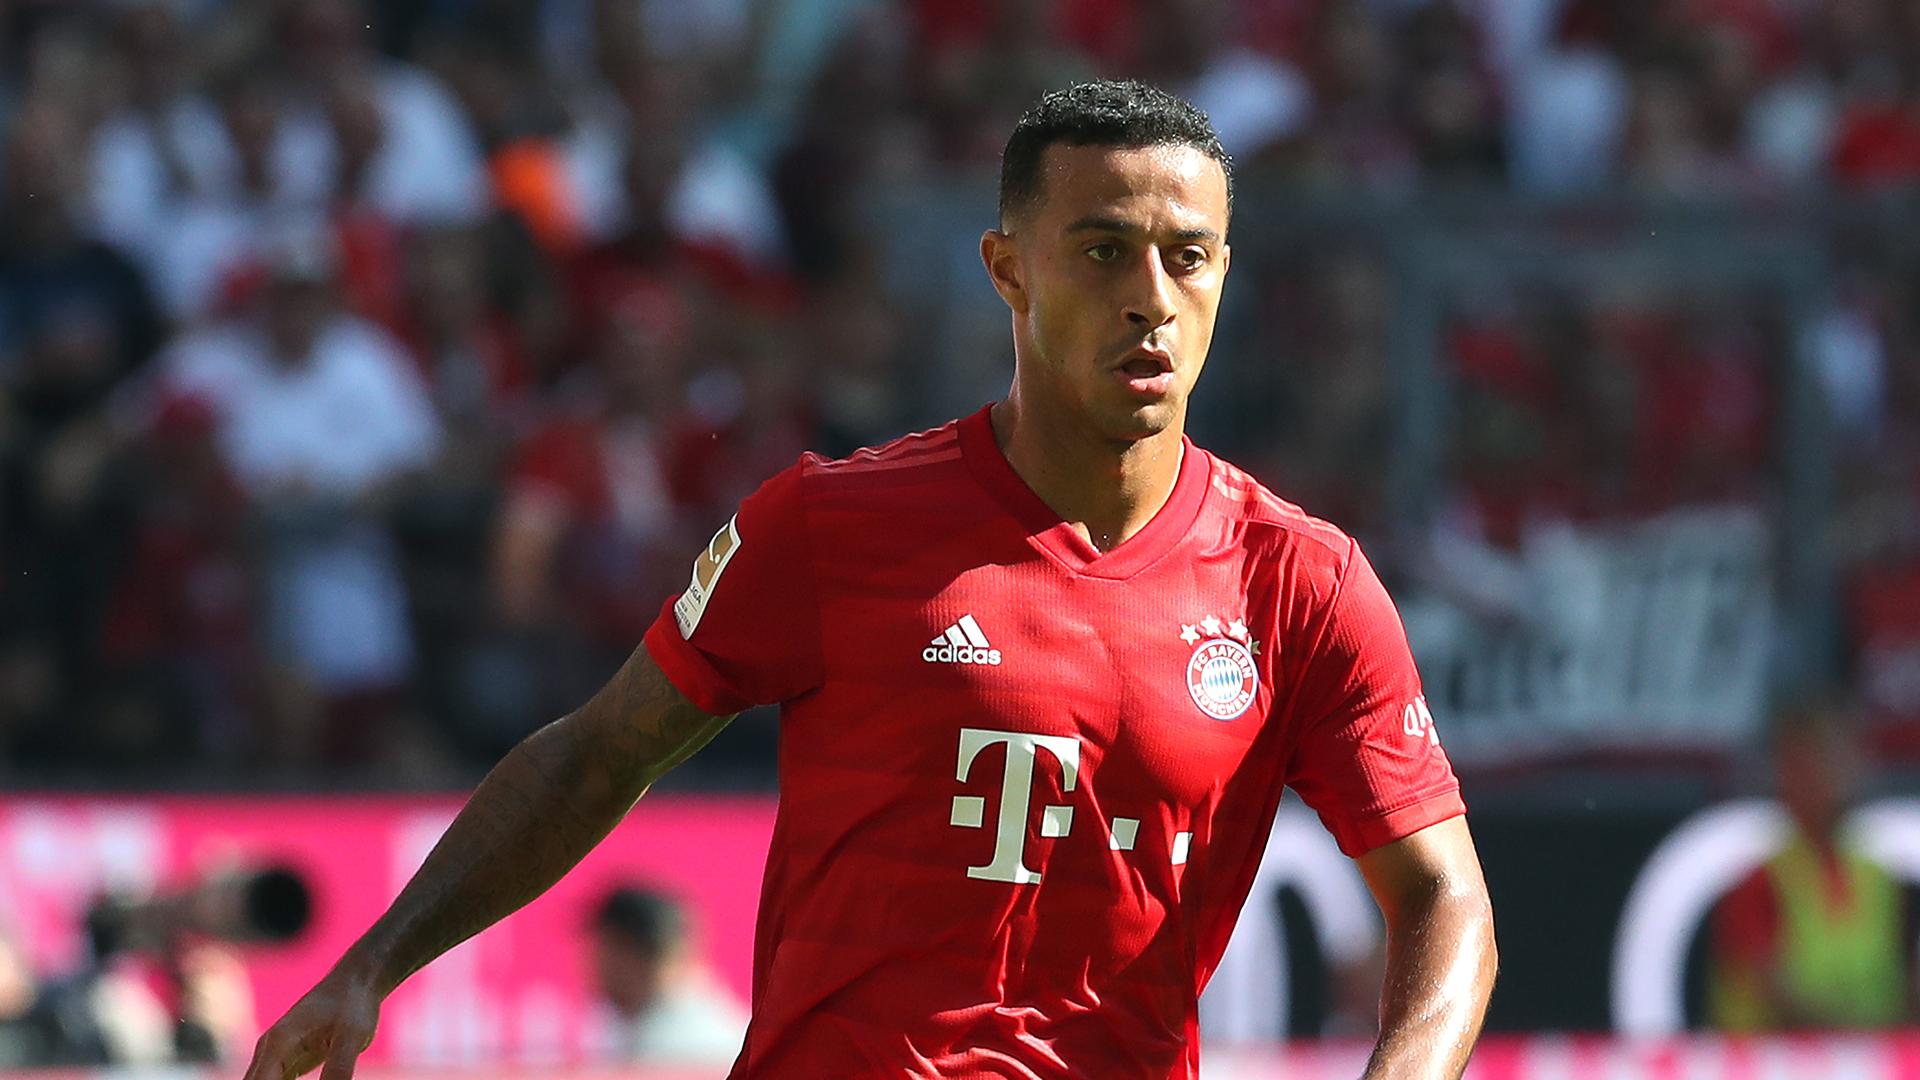 Bayern Munich manager Flick rules Thiago out of Borussia Dortmund clash